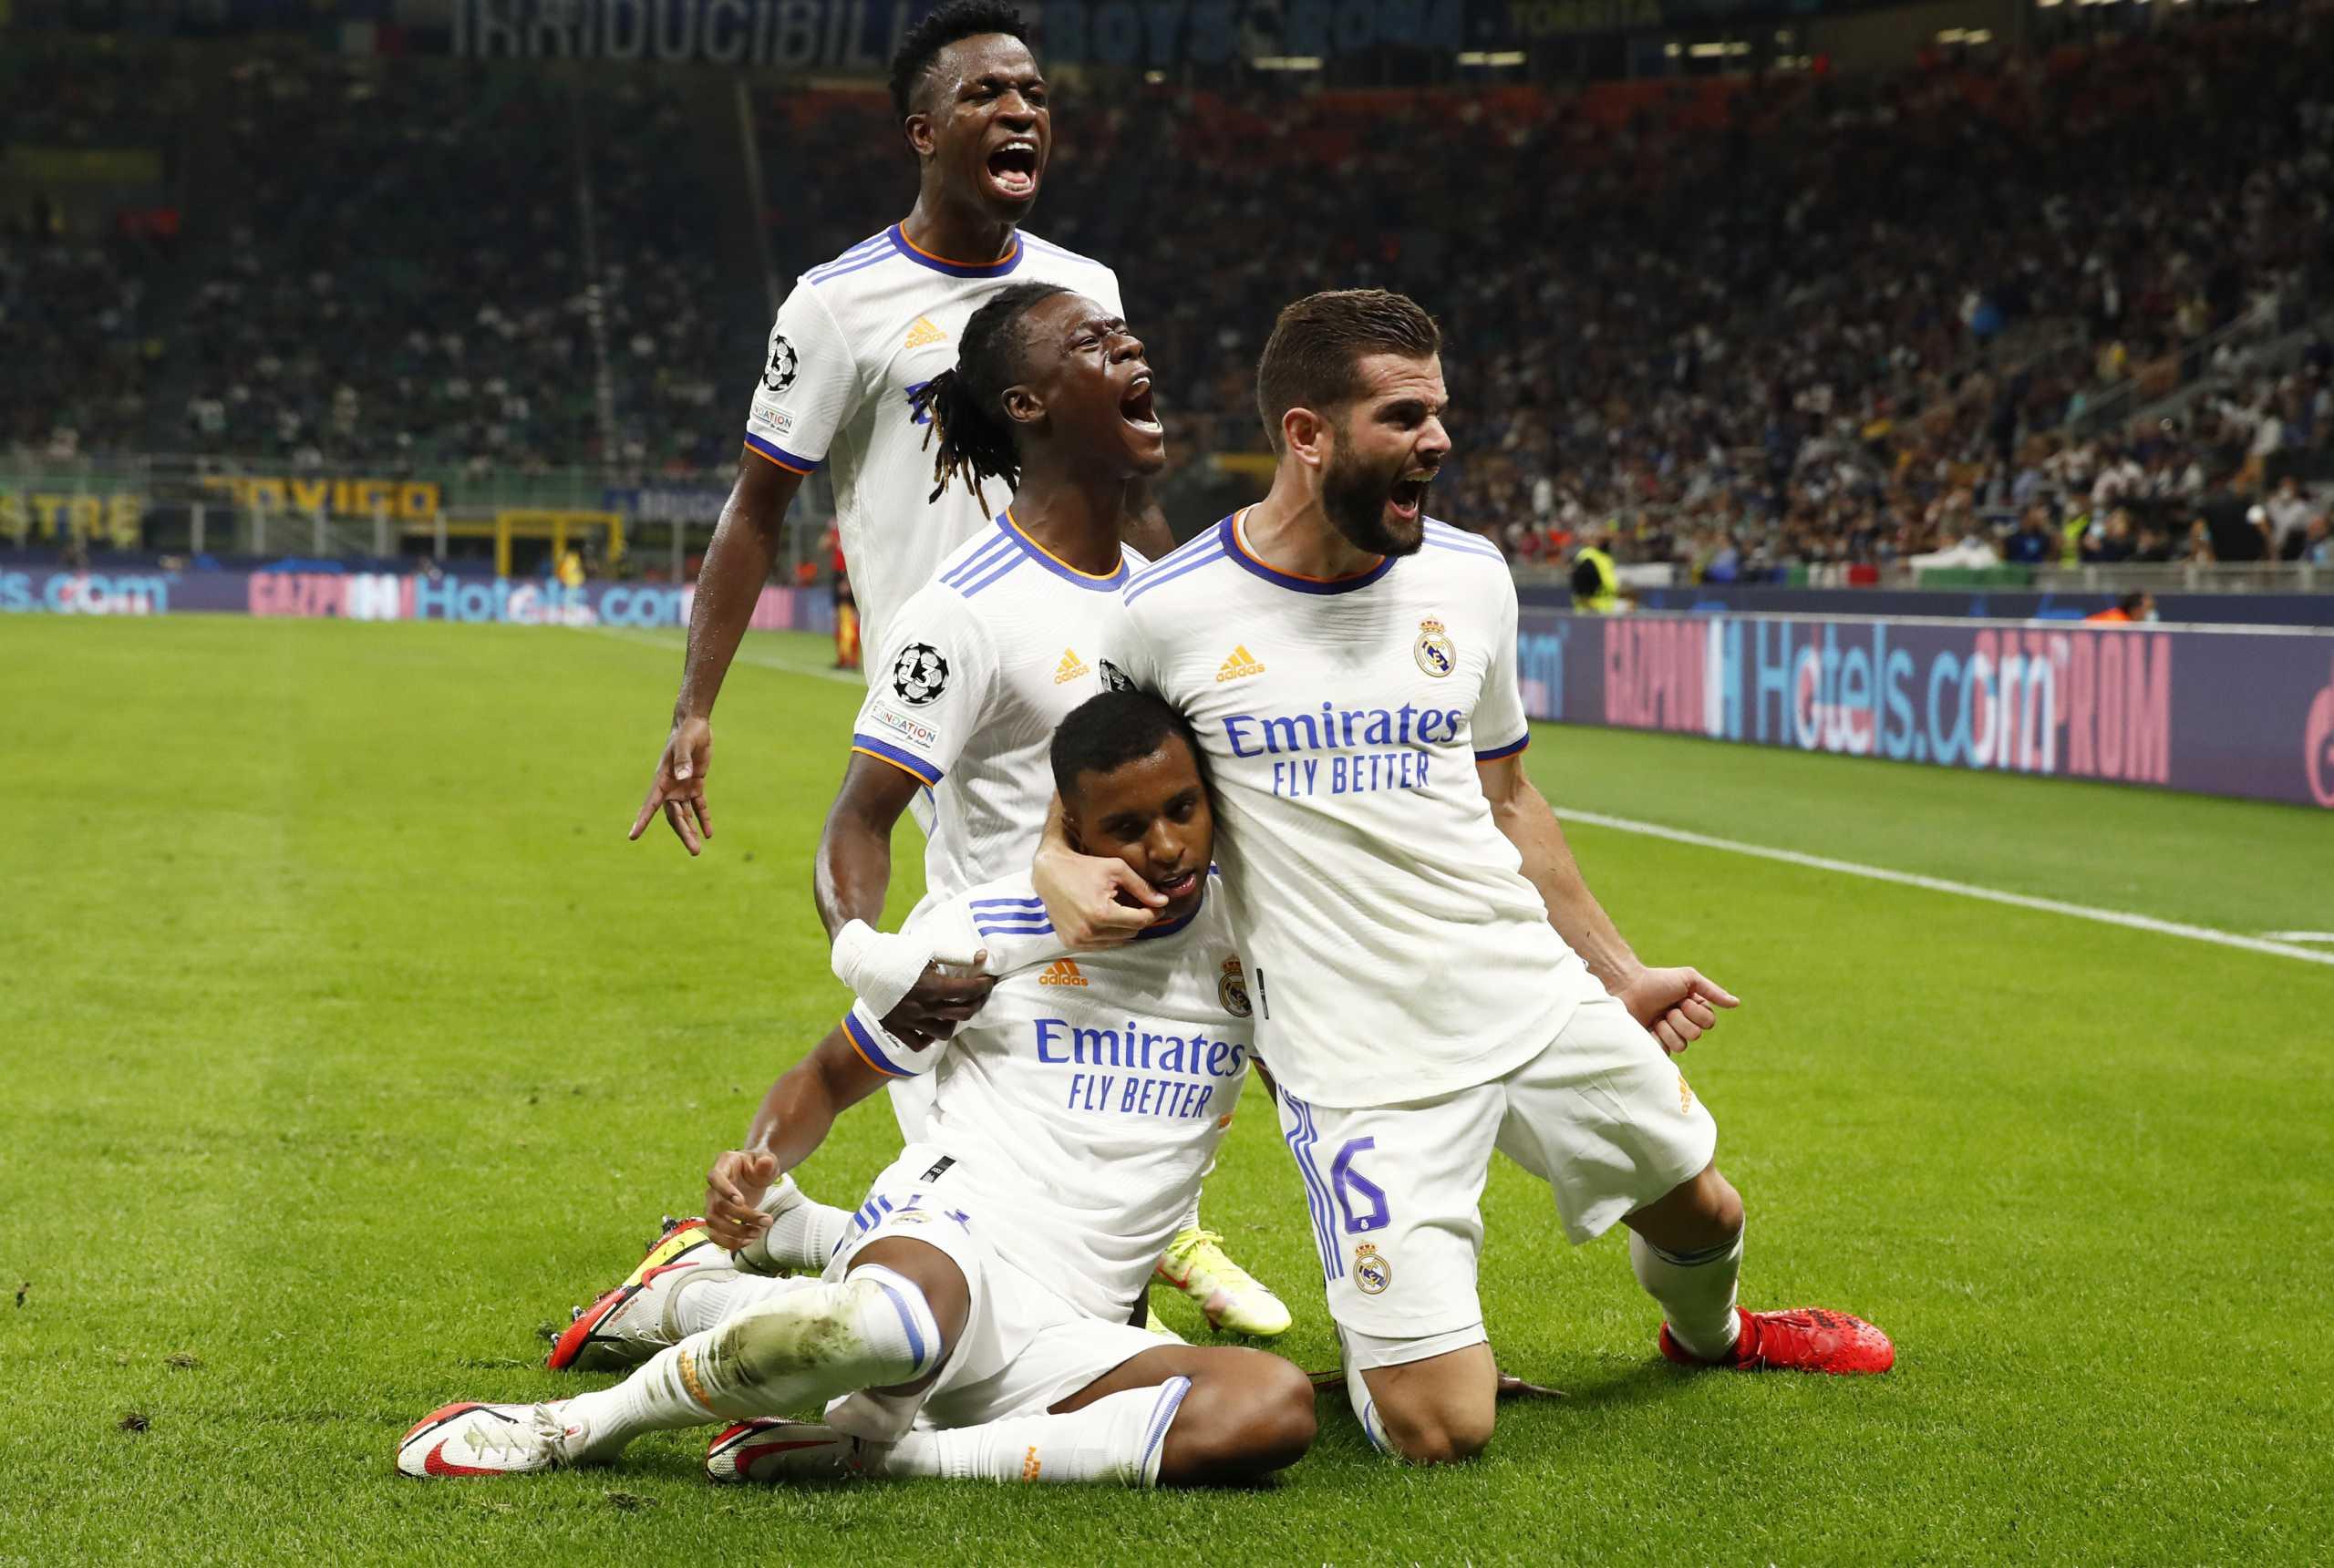 Champions League, Ίντερ – Ρεάλ 0-1: Στην κορυφή του τέταρτου ομίλου παρέα με την «ελληνική» Σέριφ οι Μαδριλένοι